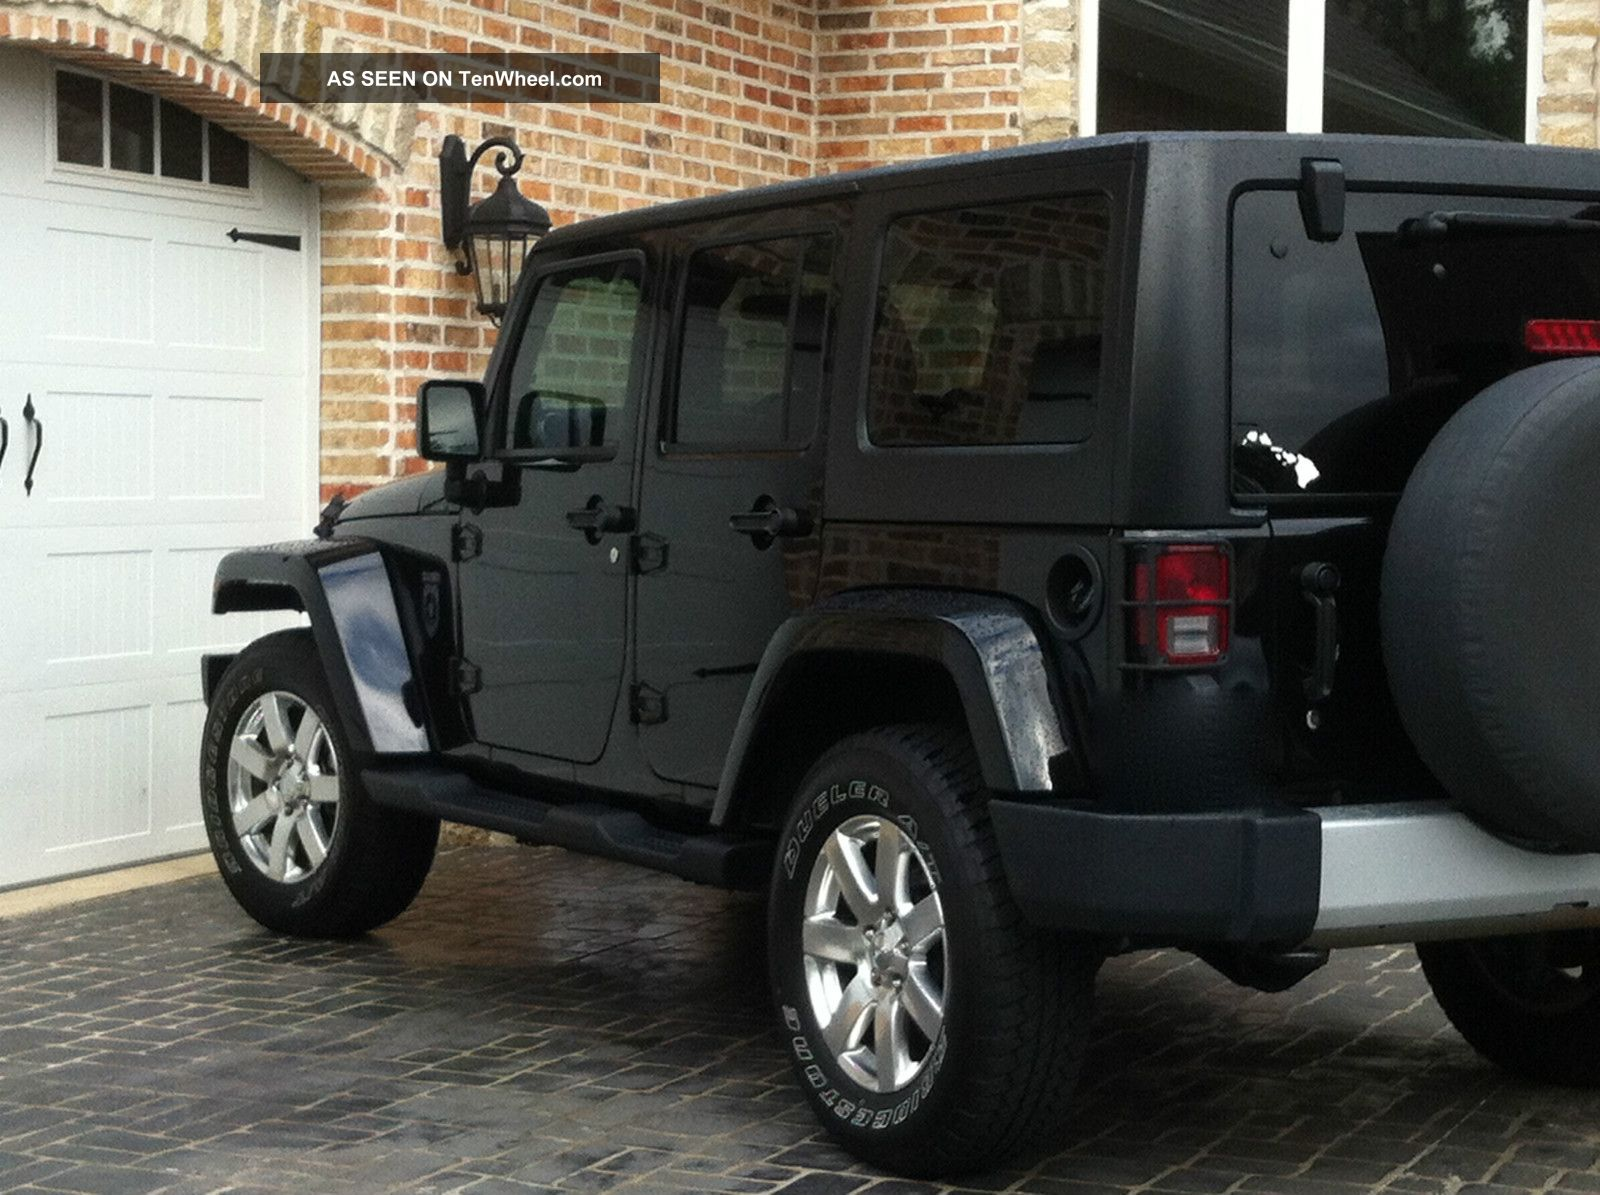 Cingular Ring Tones Gqo Jeep Wrangler Unlimited Sahara Black Rims